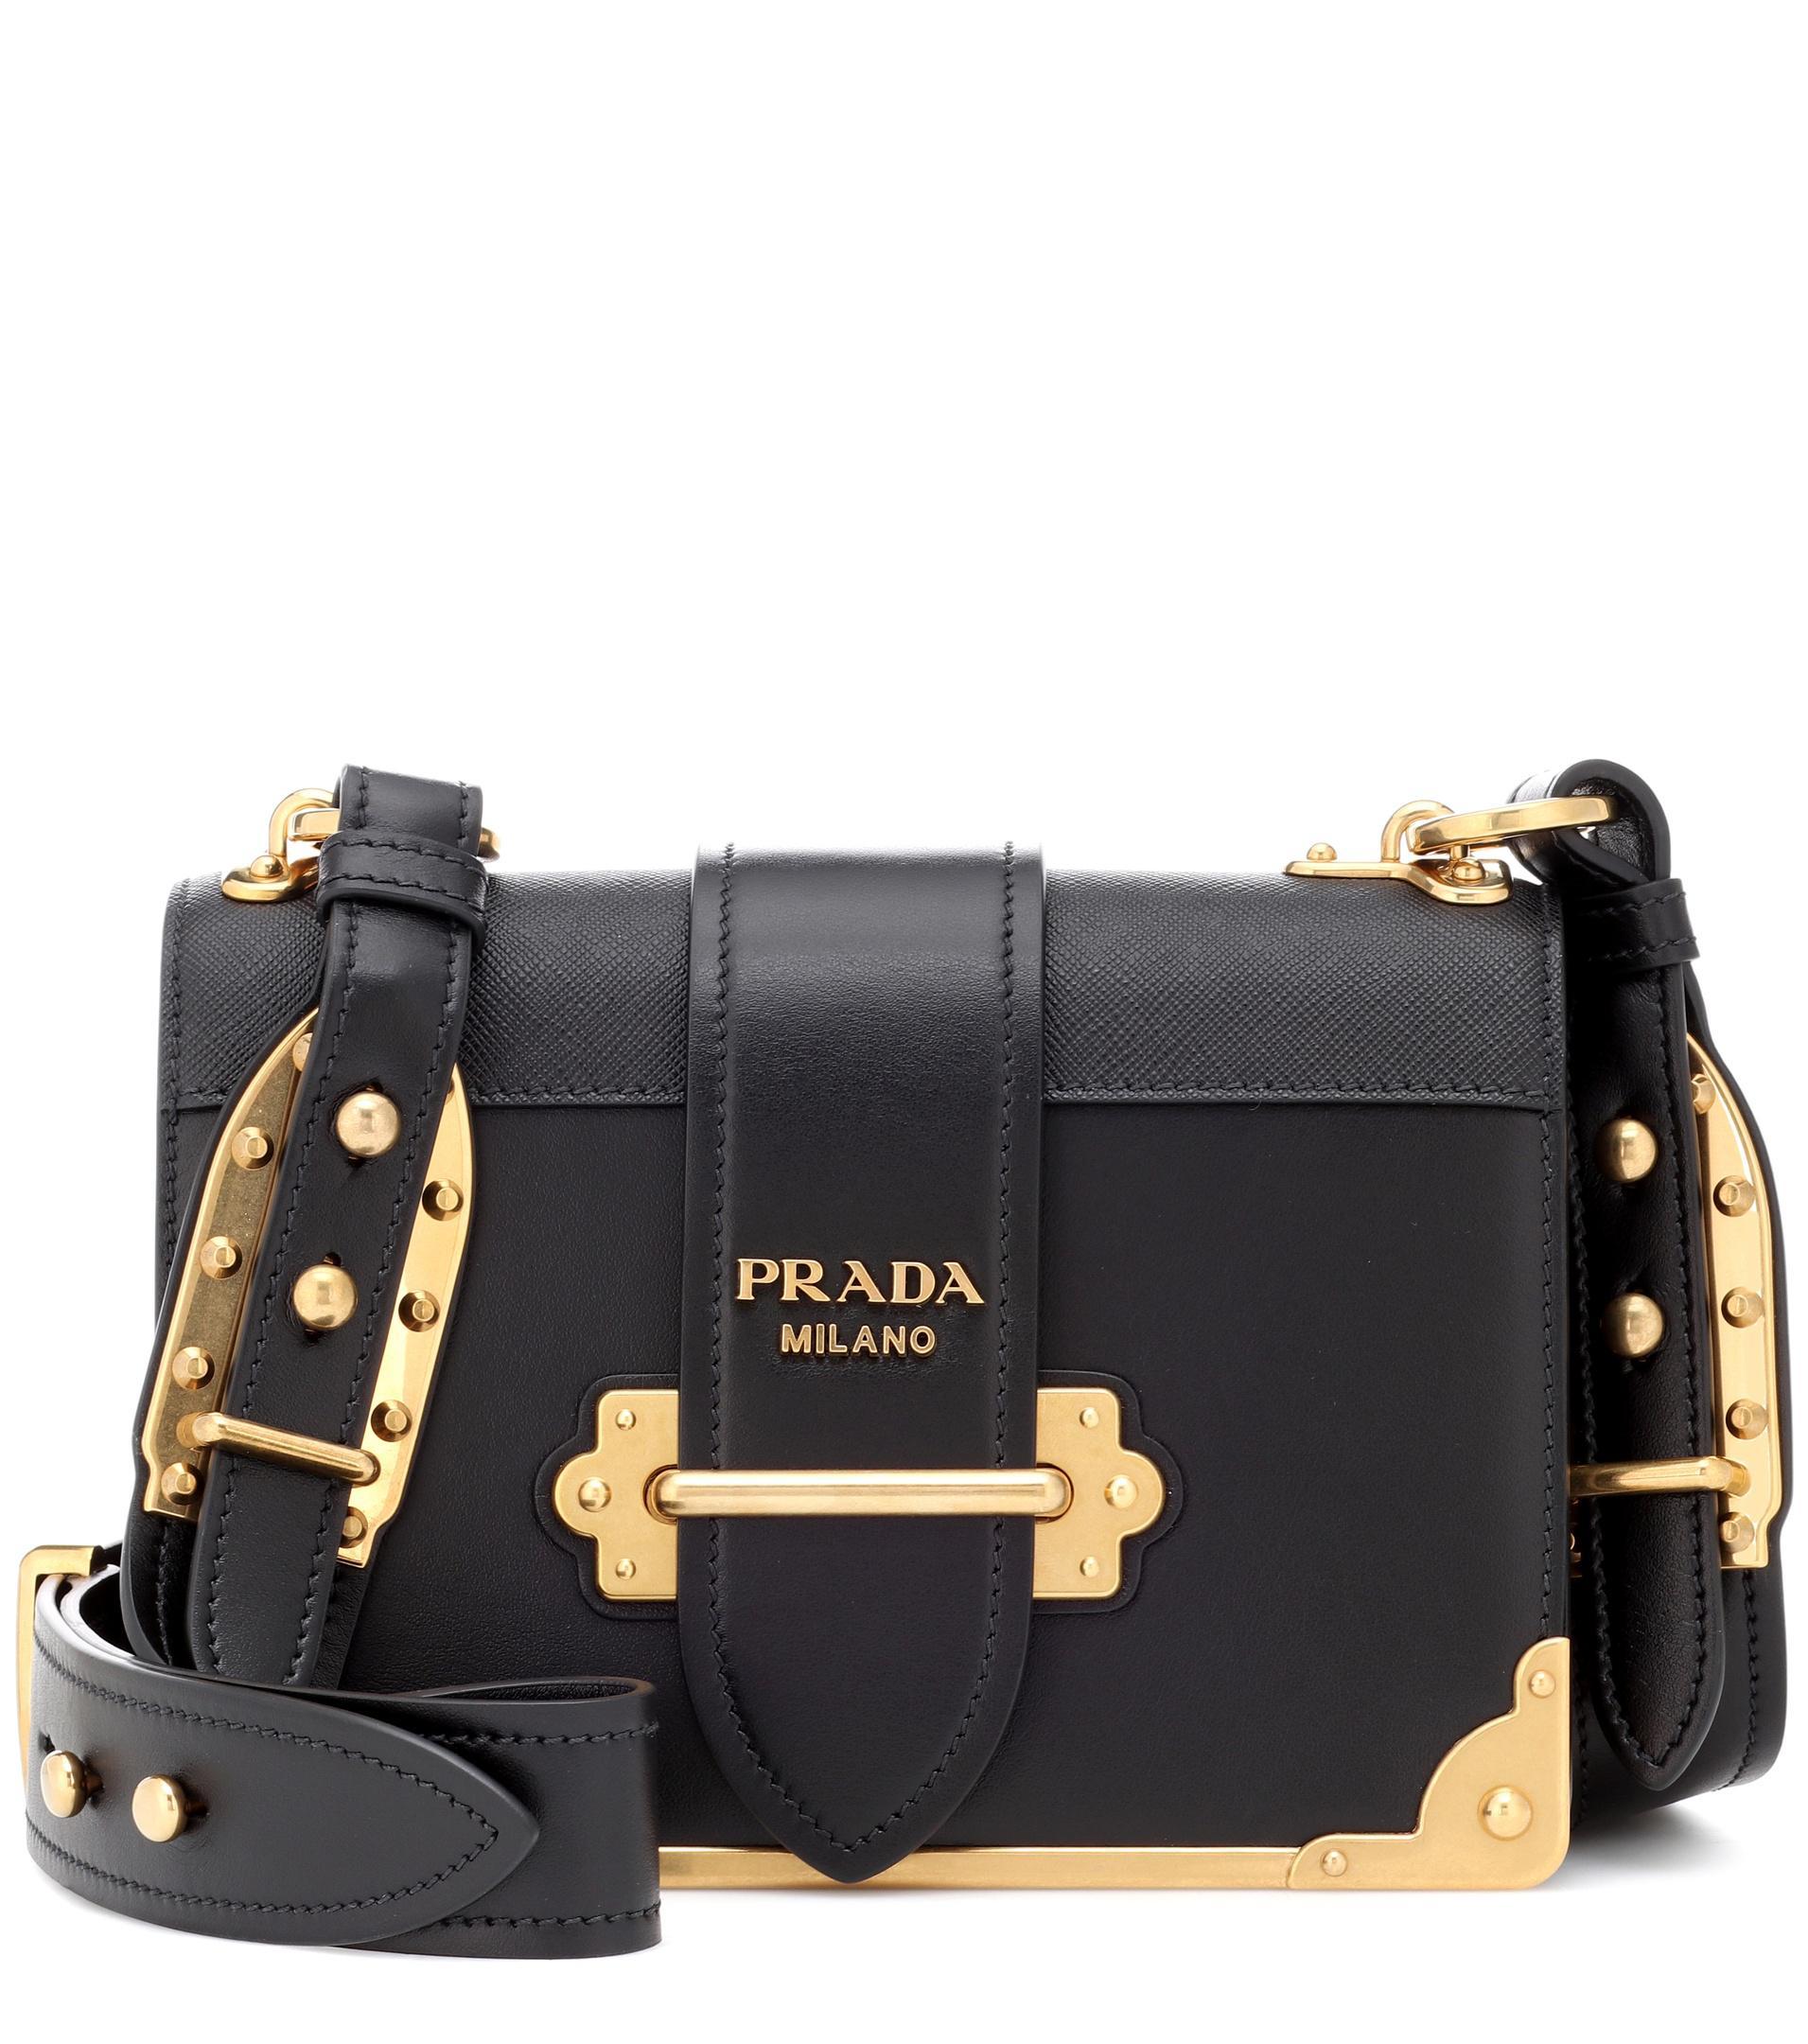 13608bd0bb98 Prada Cahier Leather Shoulder Bag in Black - Lyst